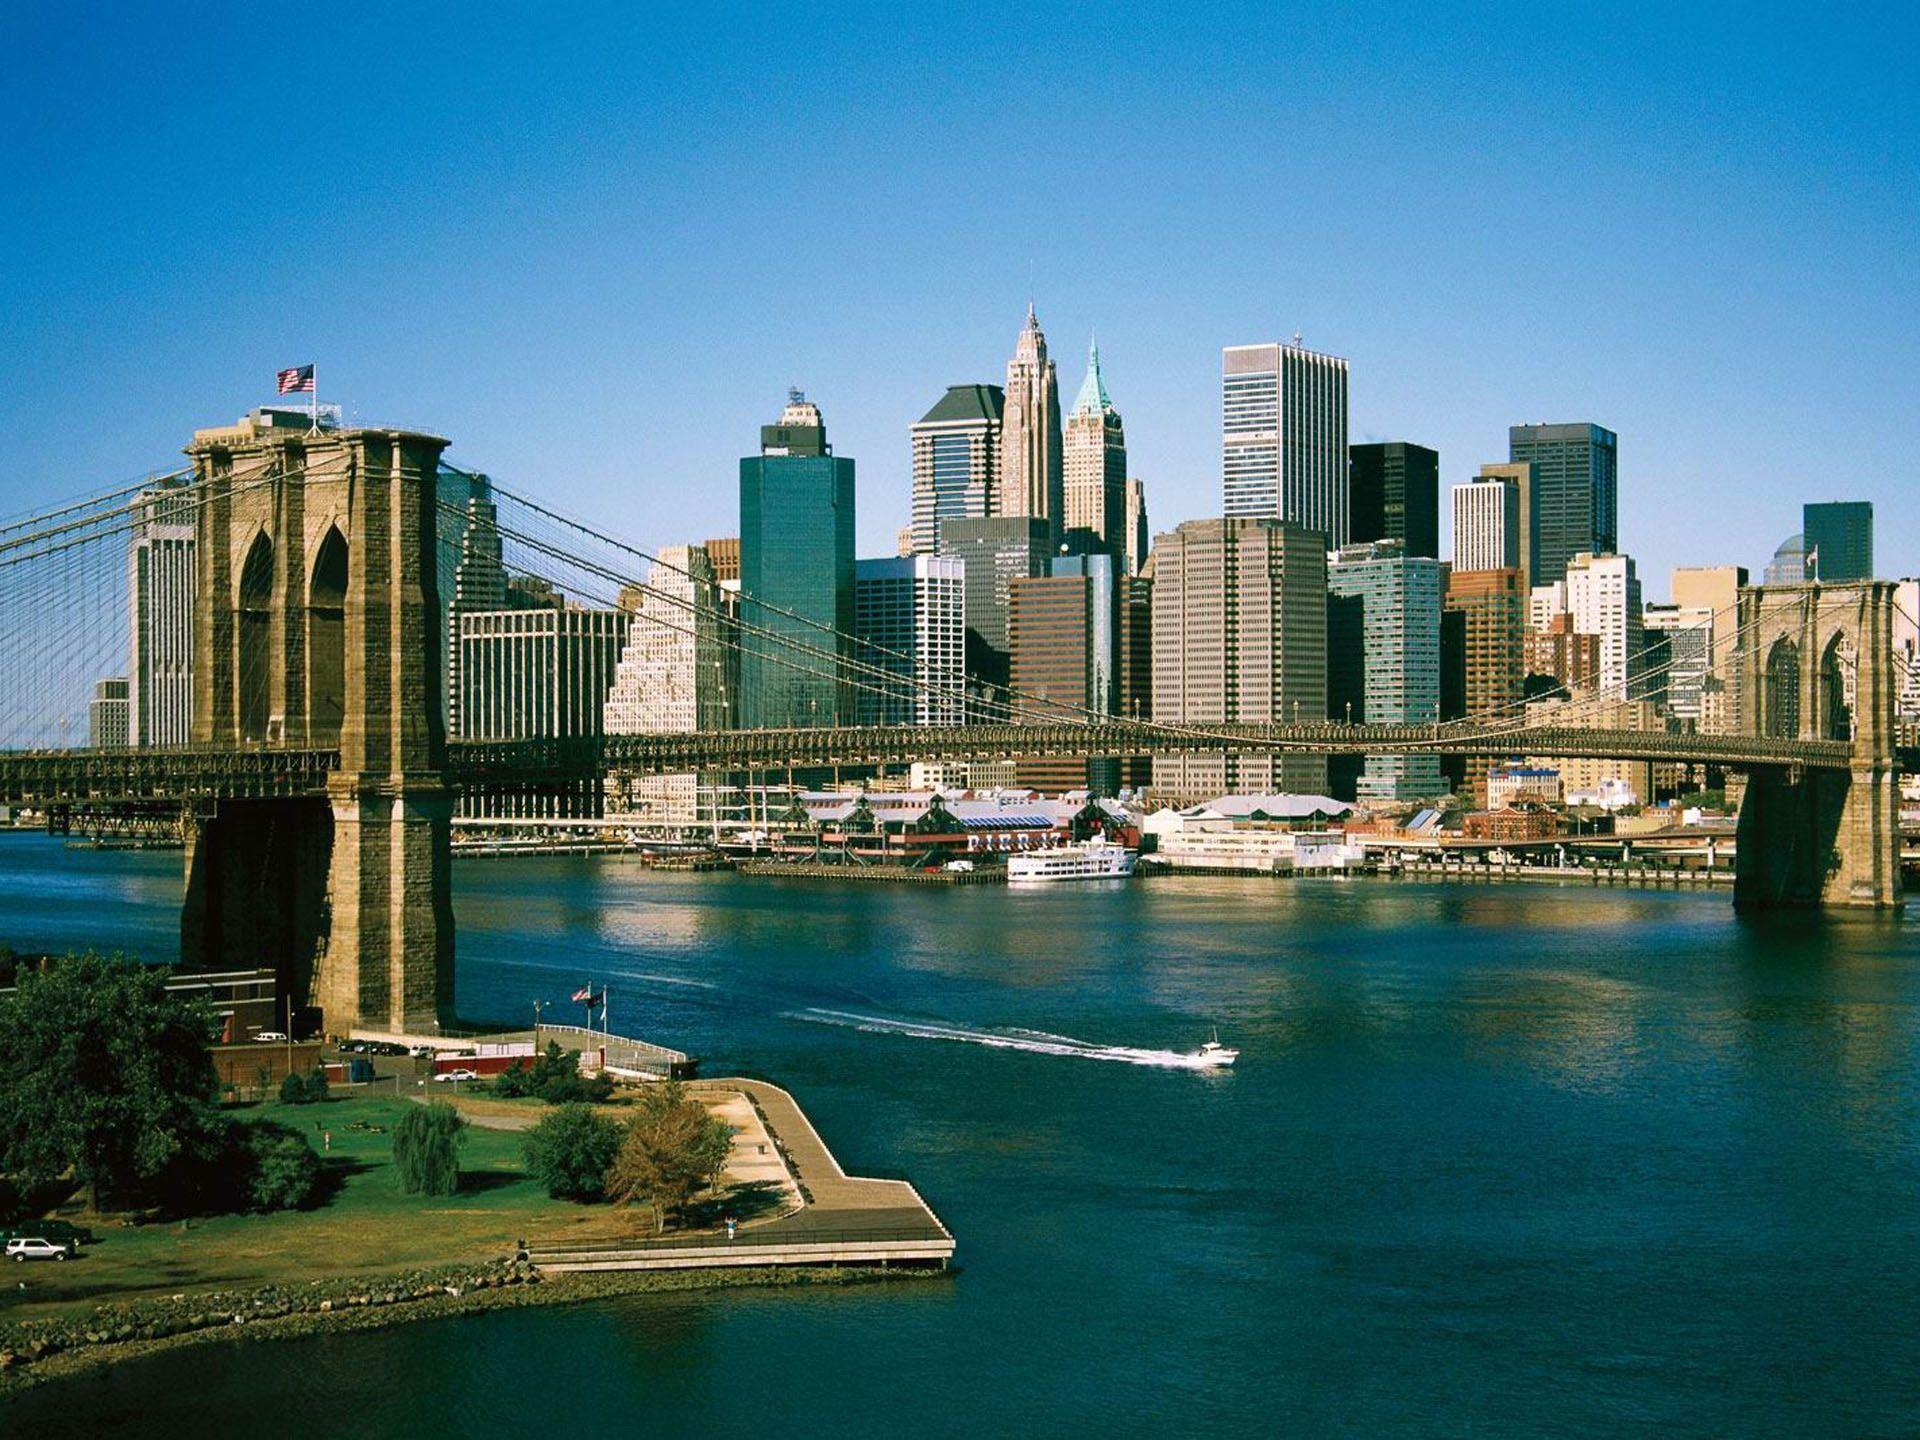 New York City Desktop Wallpapers - Wallpaper Cave